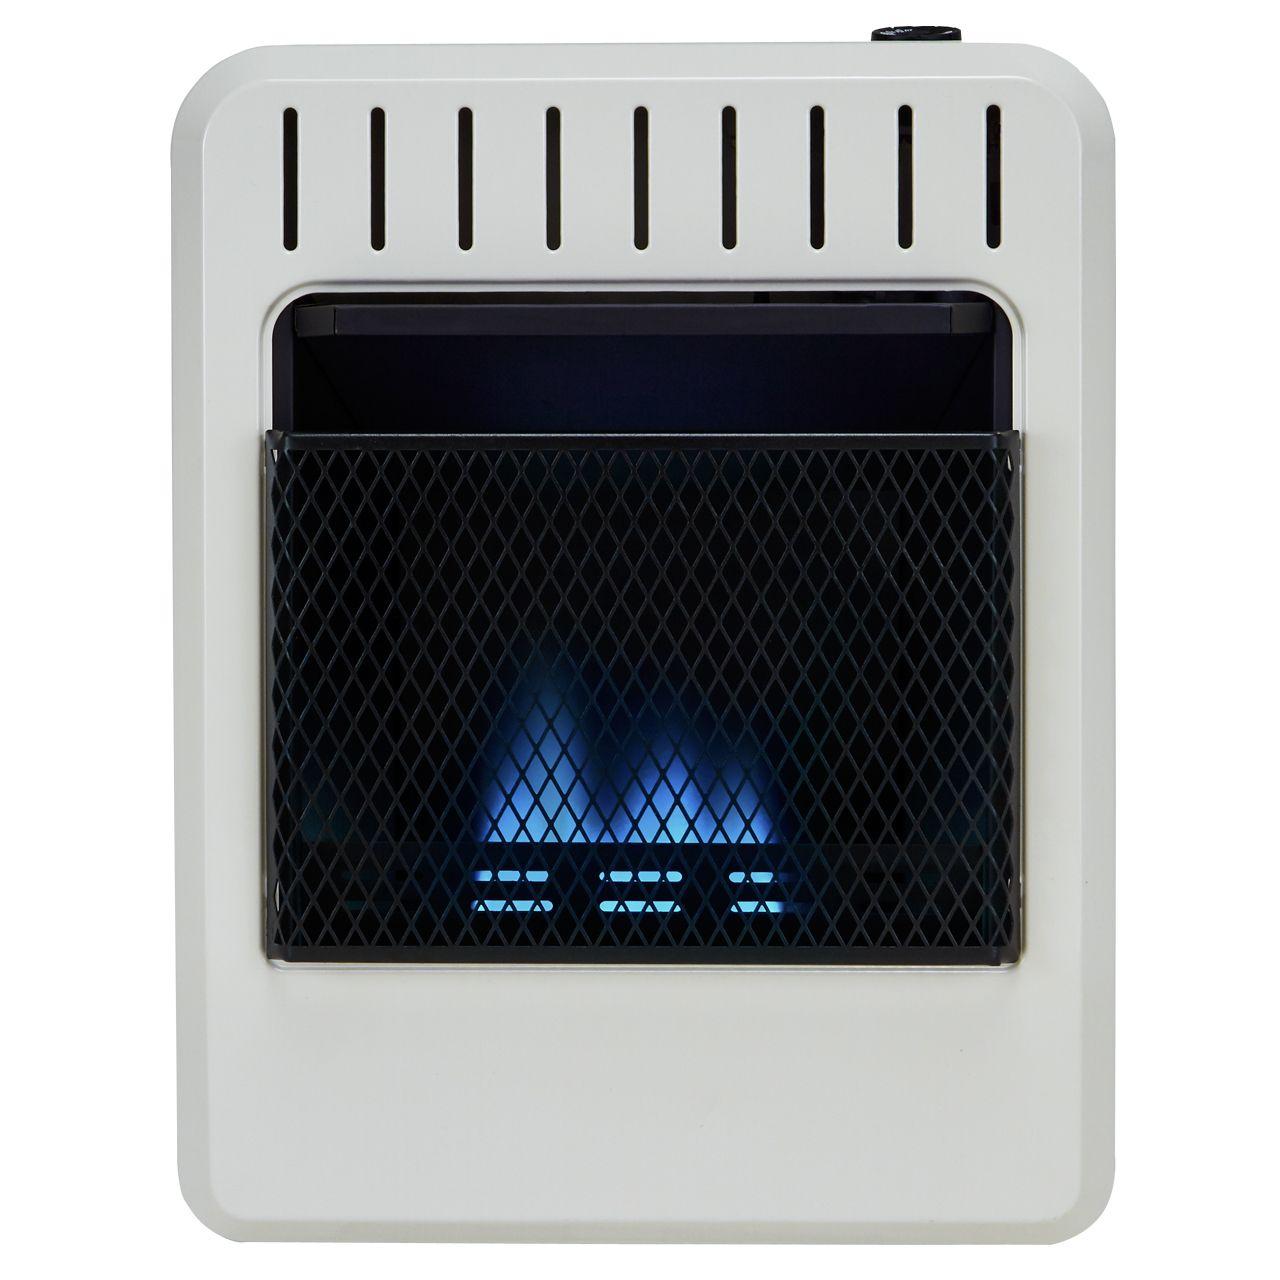 Avenger Fdt10bfa Dual Fuel Ventless Blue Flame Gas Heater